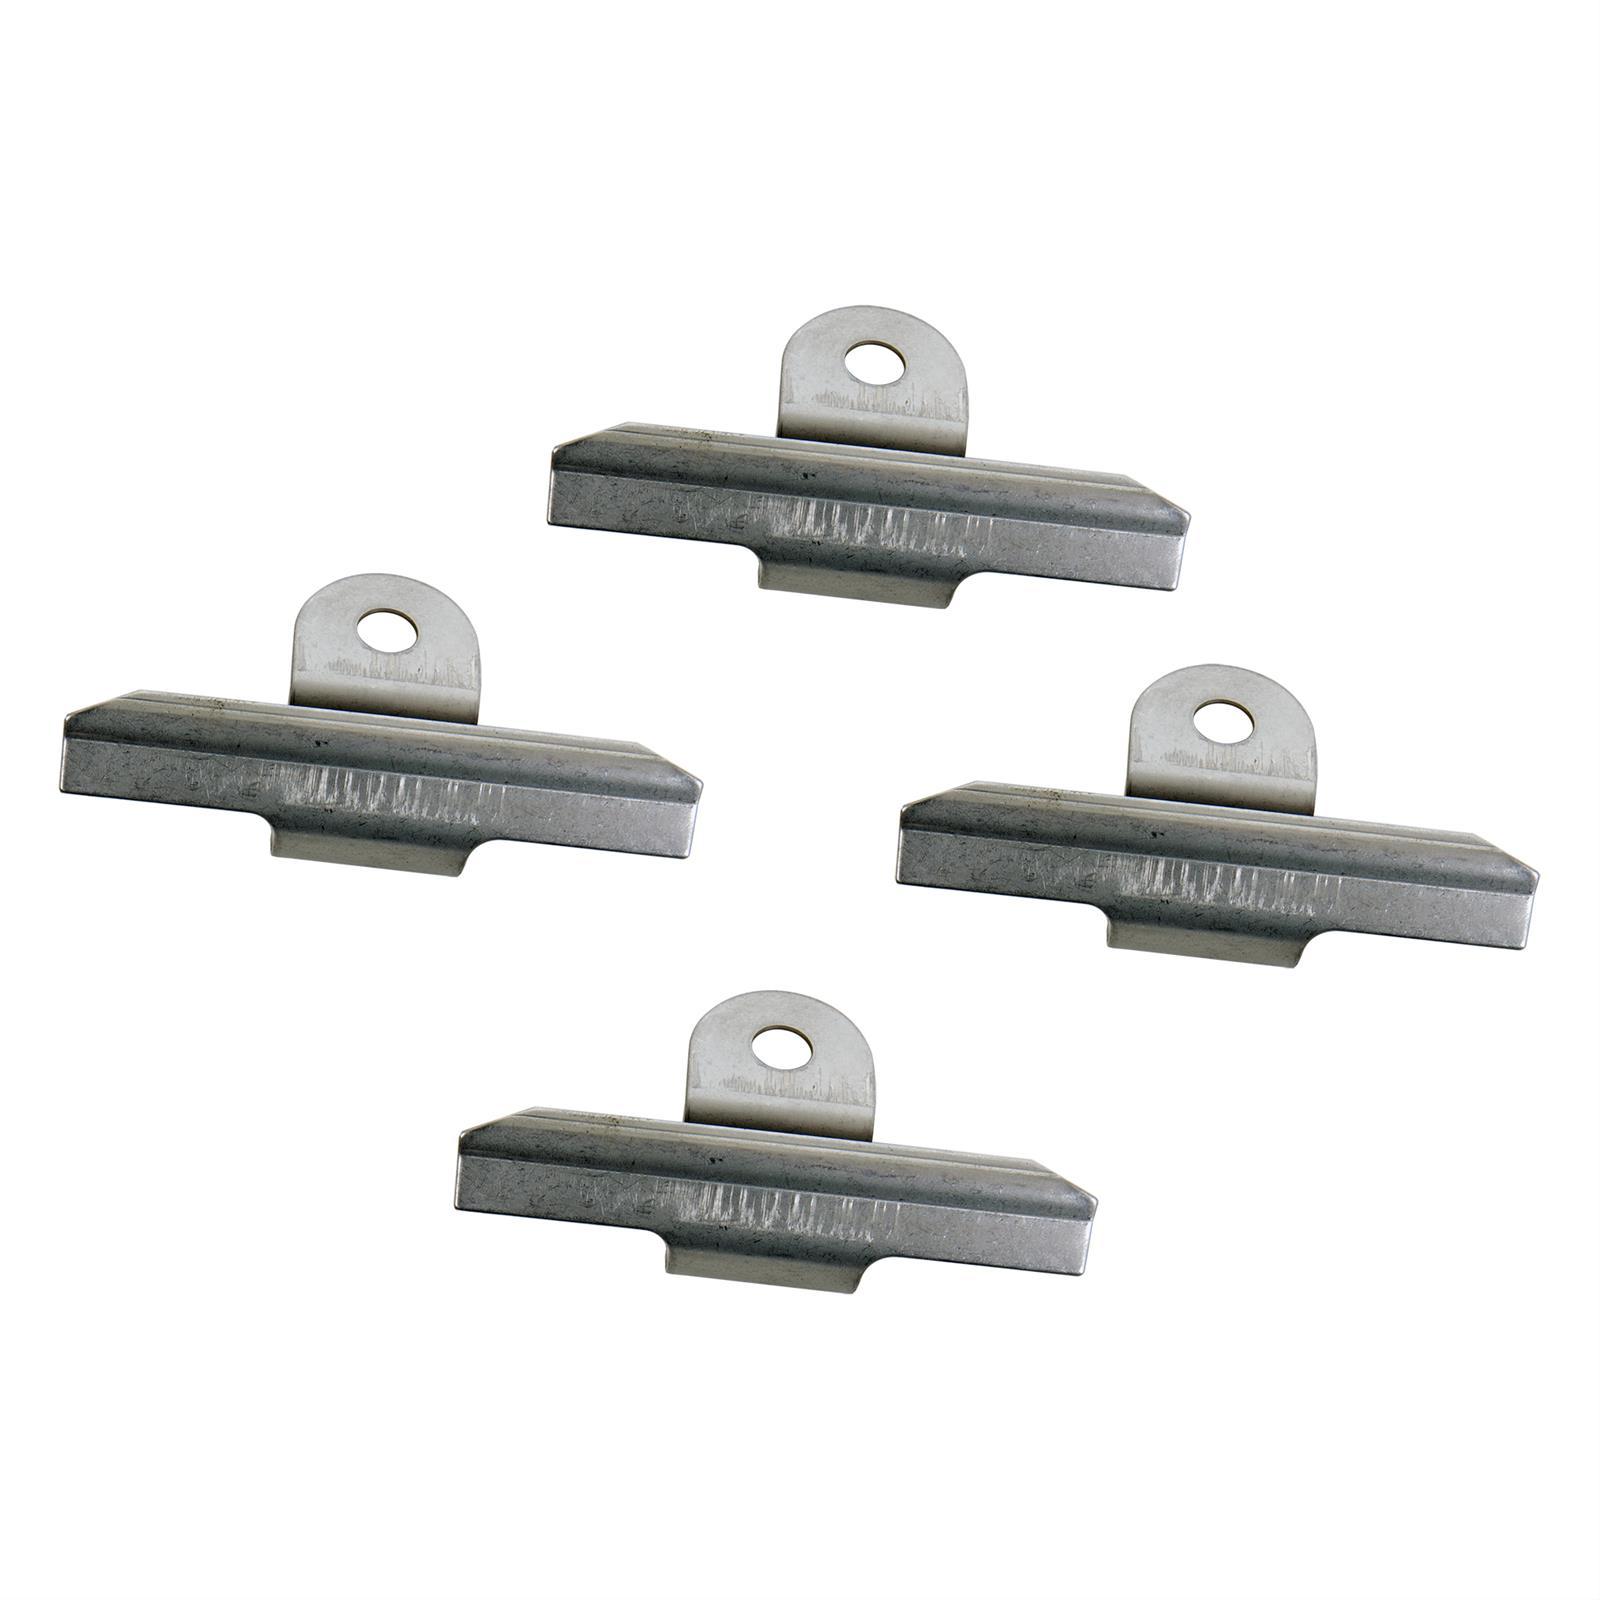 Frt Disc Brake Hardware Kit  Centric Parts  117.91025